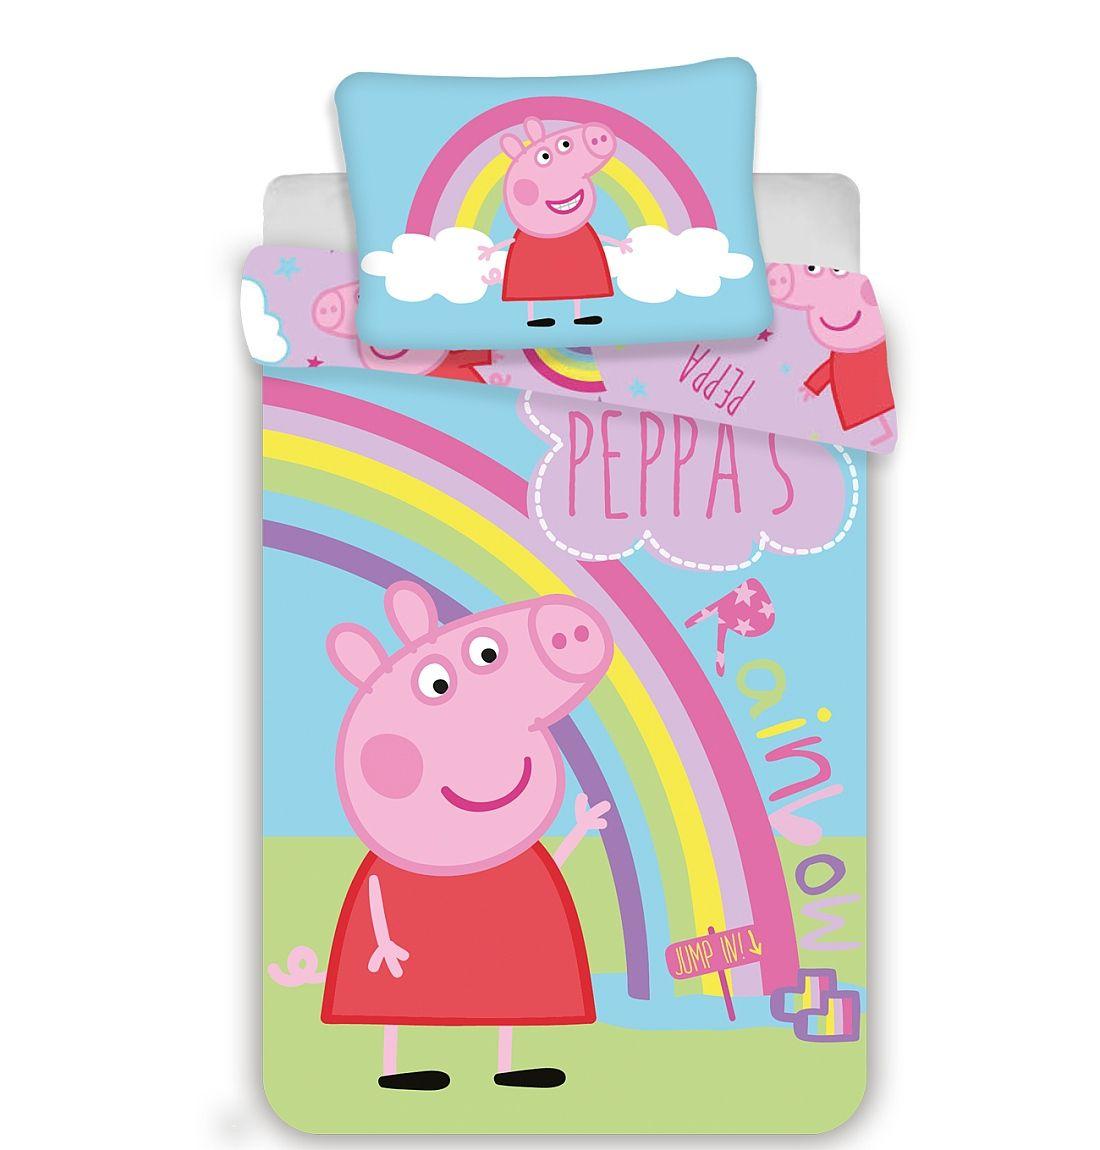 Disney povlečení do postýlky Peppa Pig 016 baby Jerry Fabrics